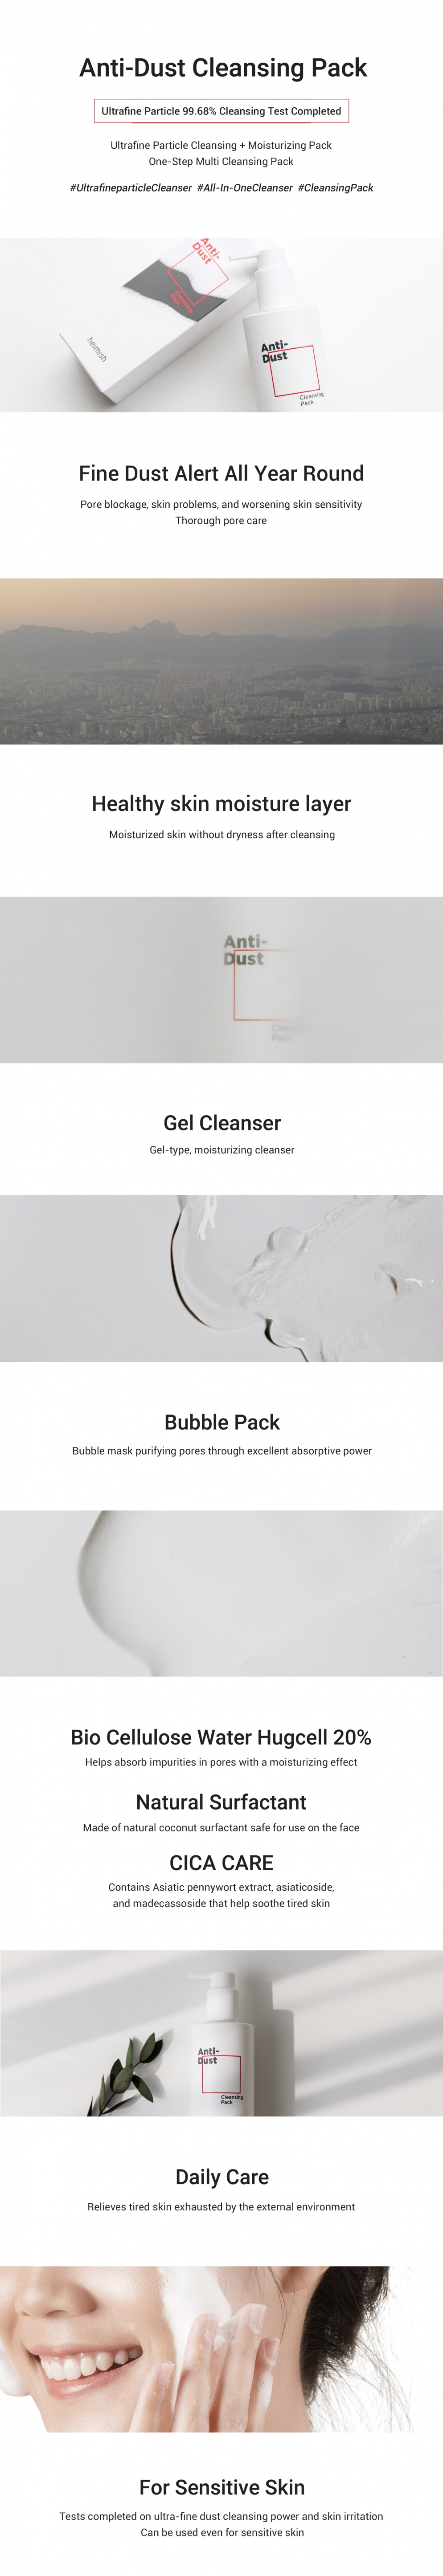 [heimish] Anti-Dust Cleansing Pack 250ml